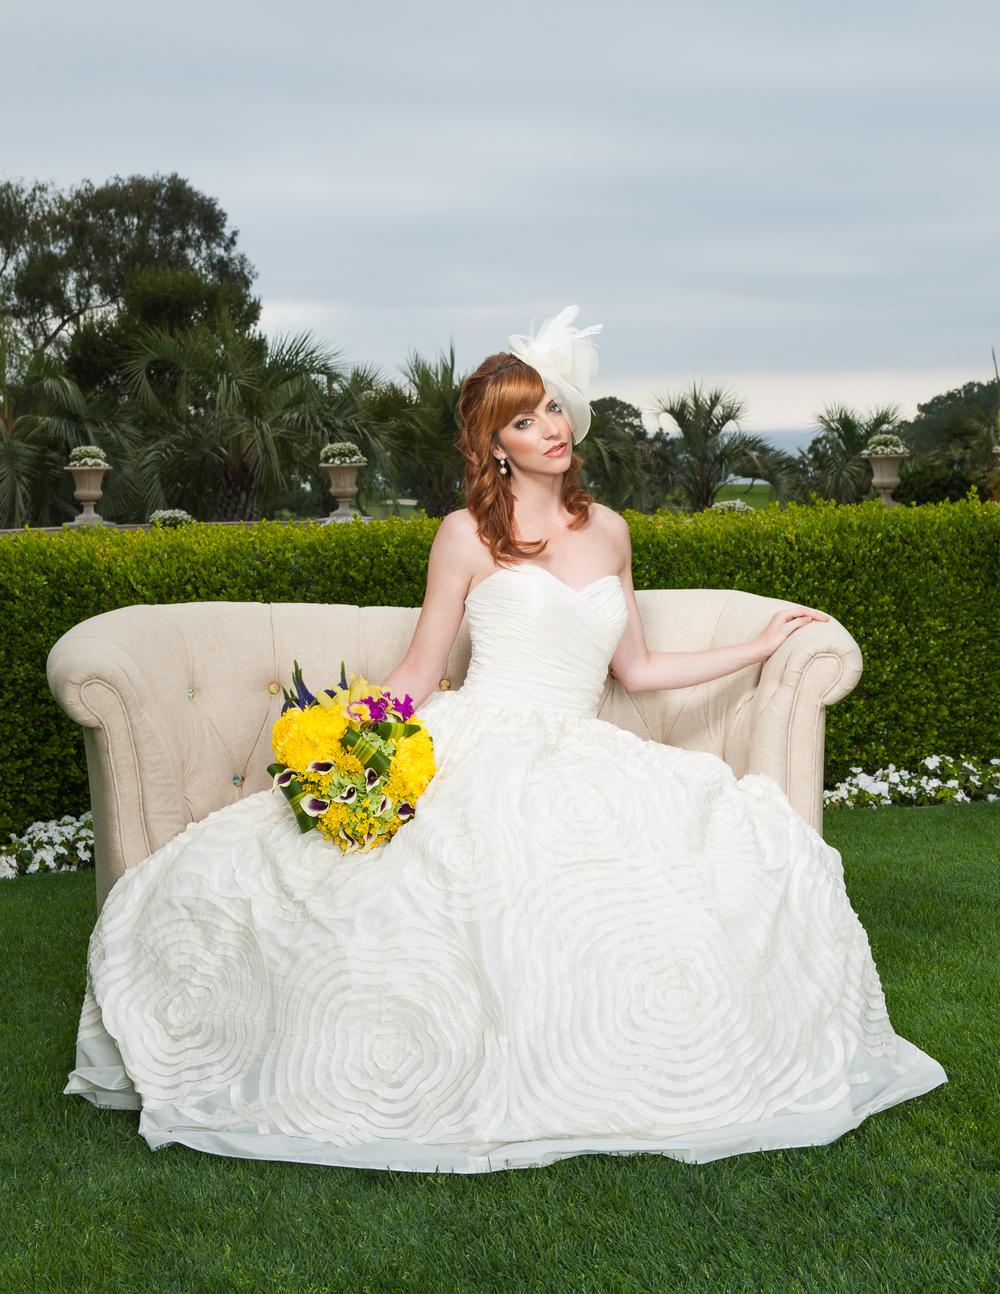 stewart_bertrand_wedding_photography_sdsw13-1001.jpg